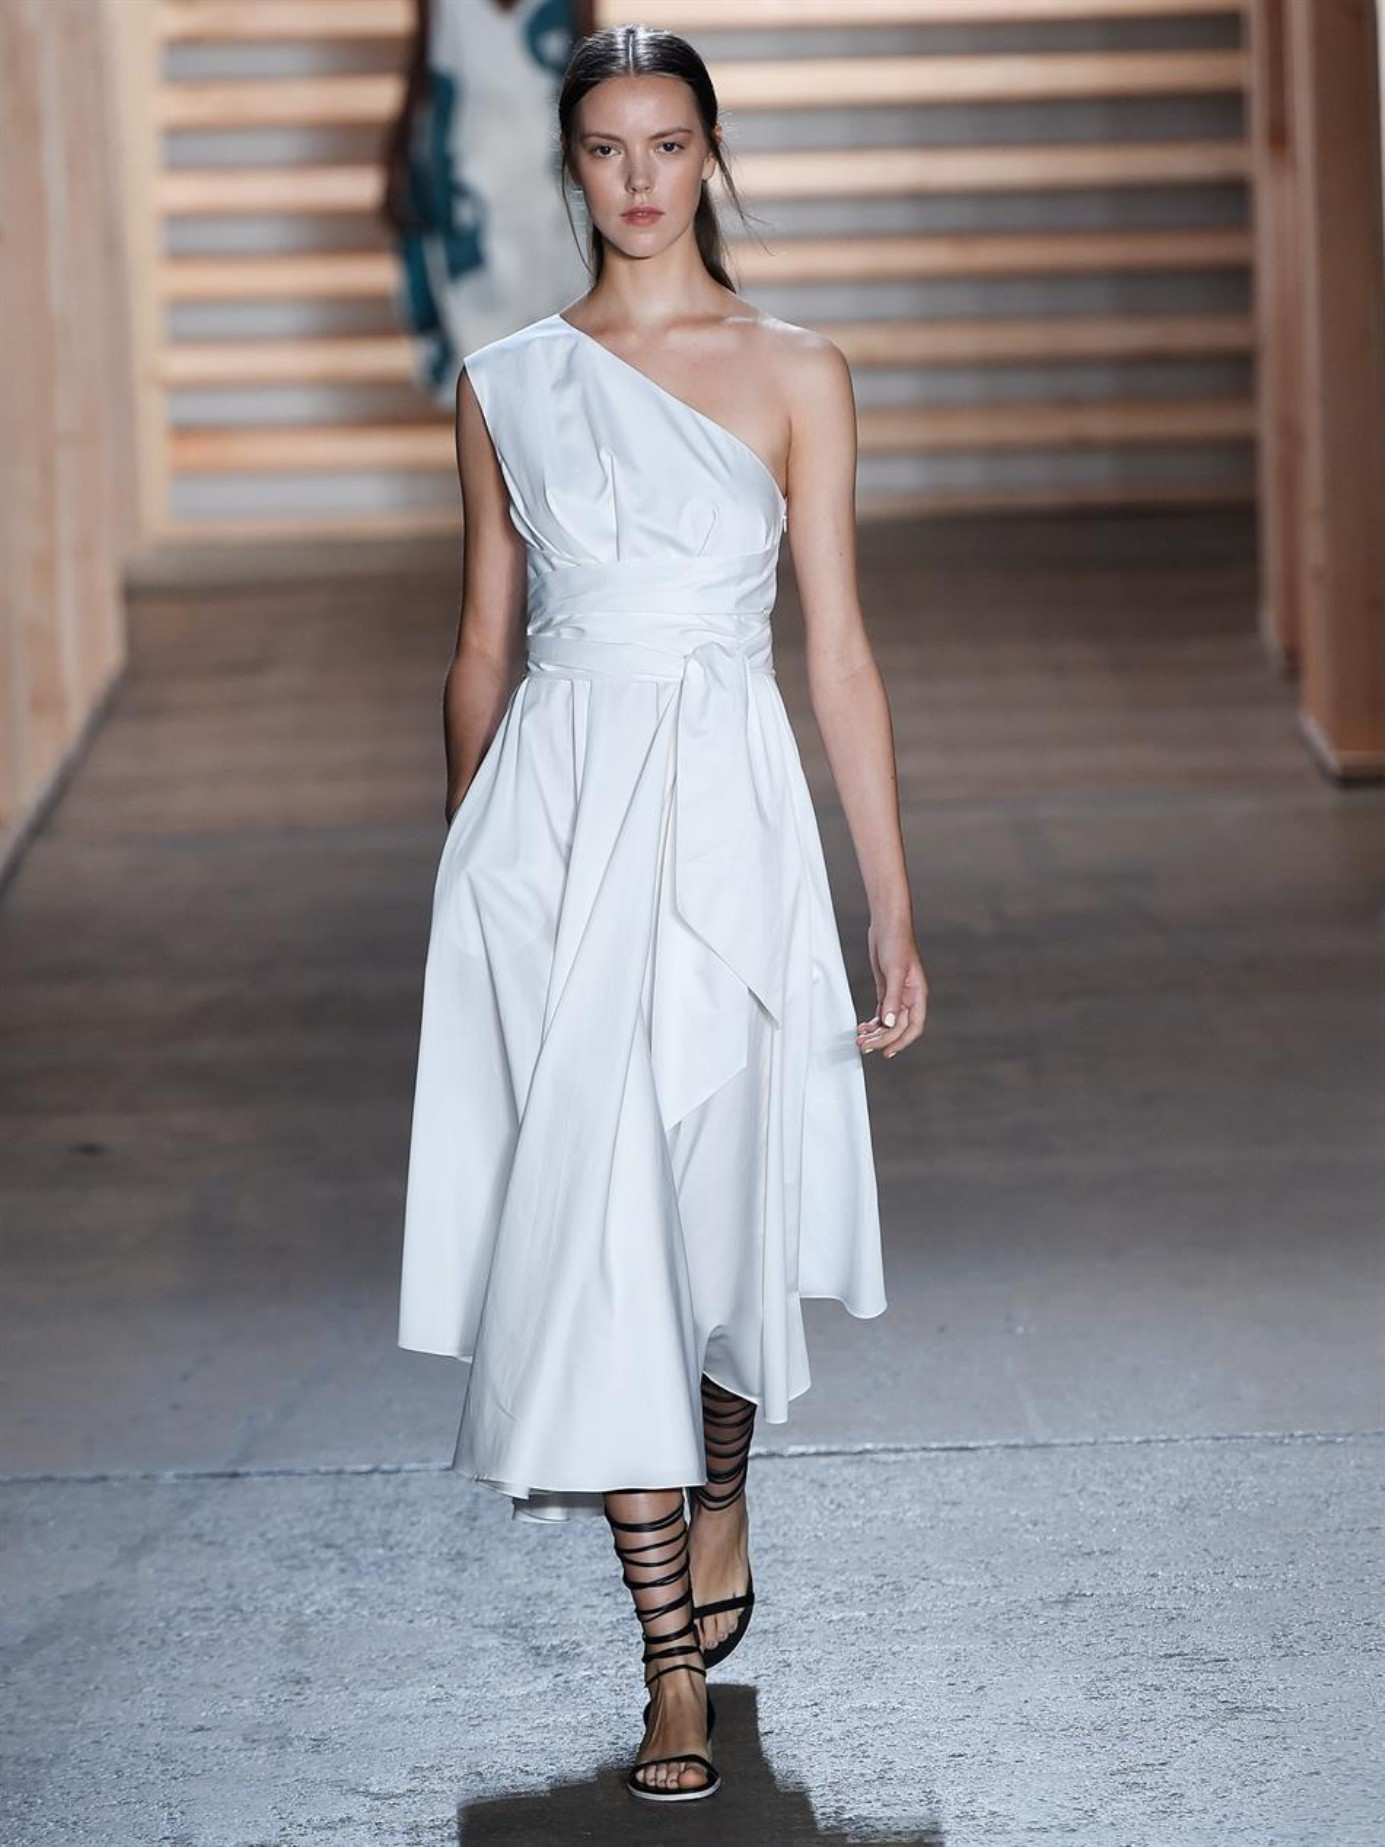 01de0563ed3 Tibi One-Shoulder Cotton-Poplin Dress in White - Lyst